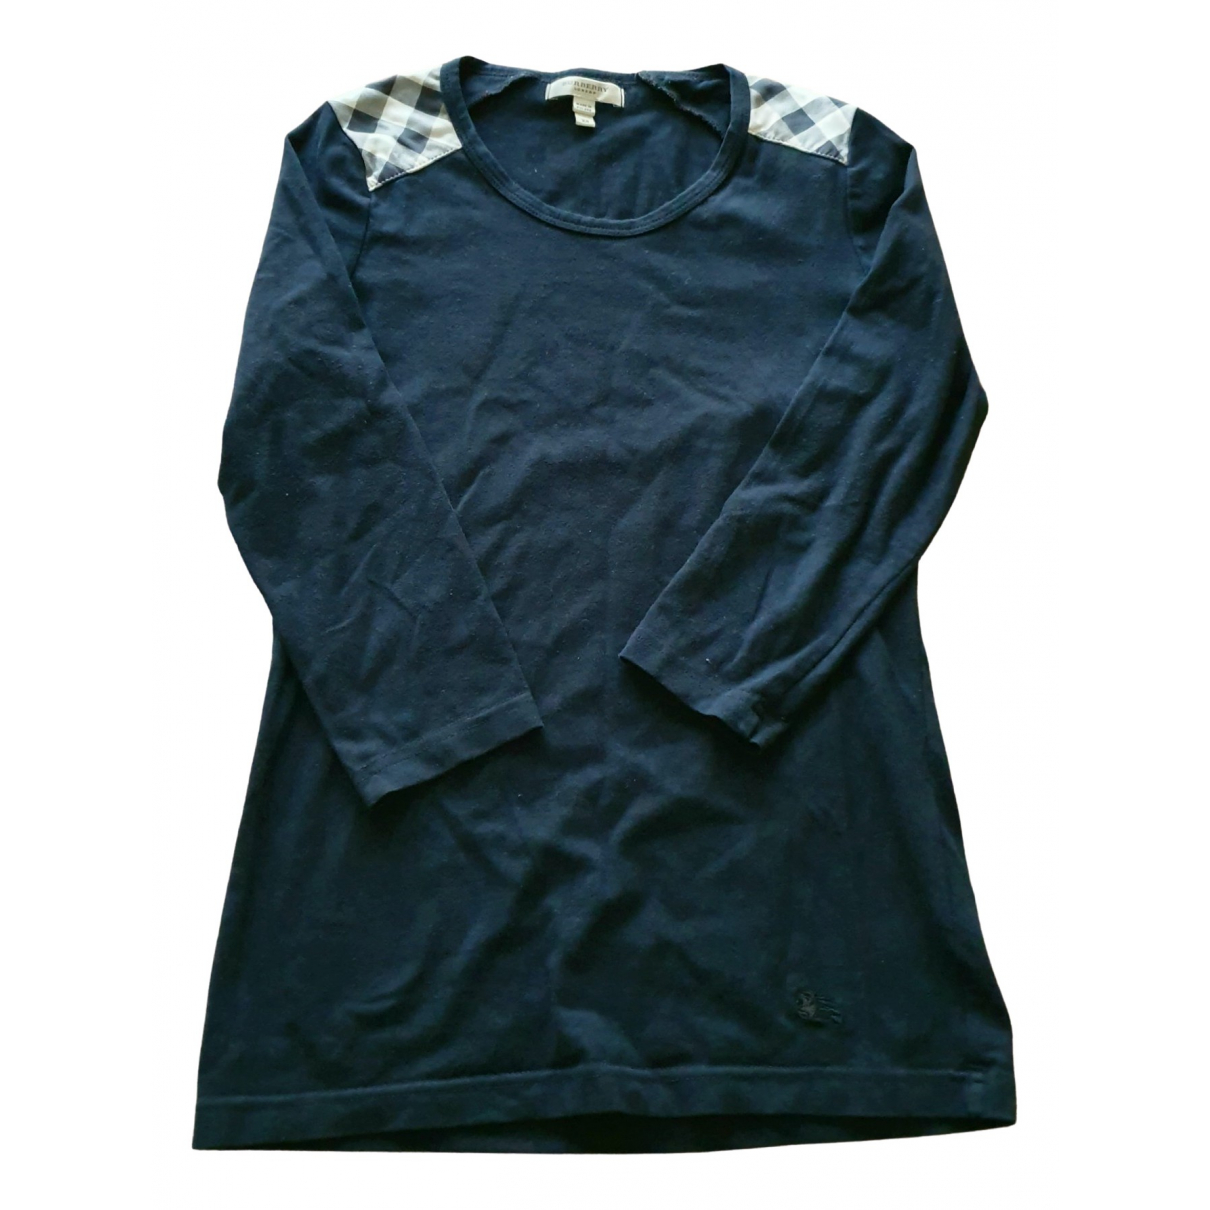 Burberry \N Black Cotton  top for Women XS International